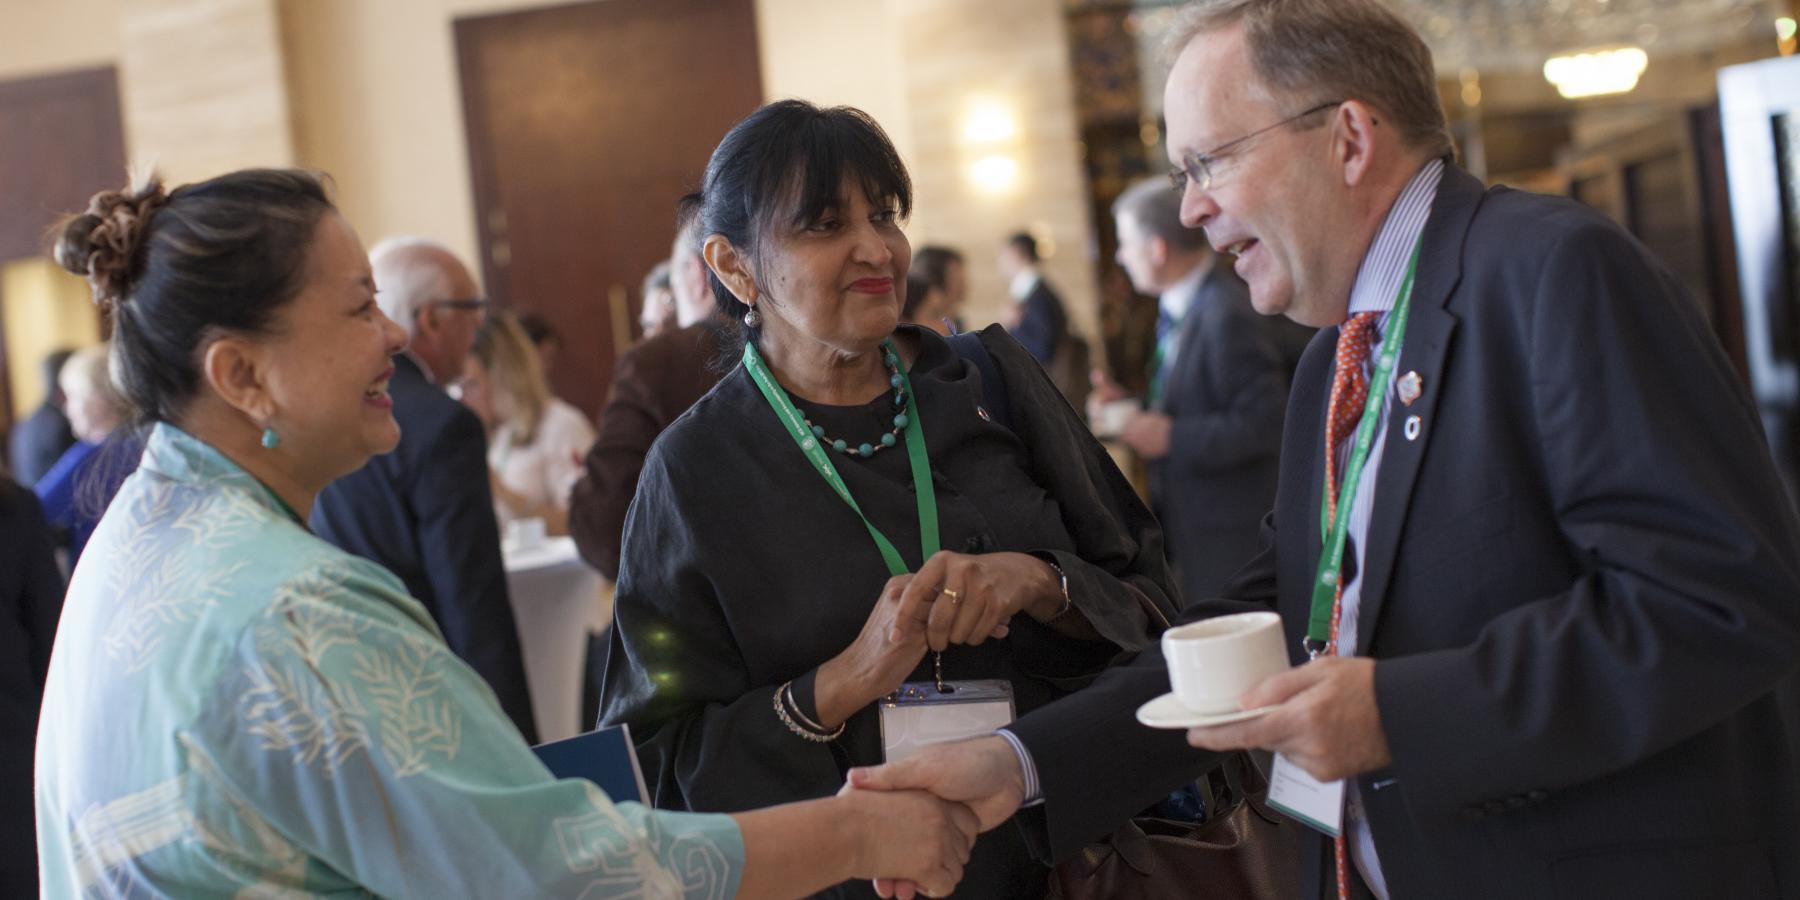 Global NCD Alliance Forum 2015, Sharjah (UAE)